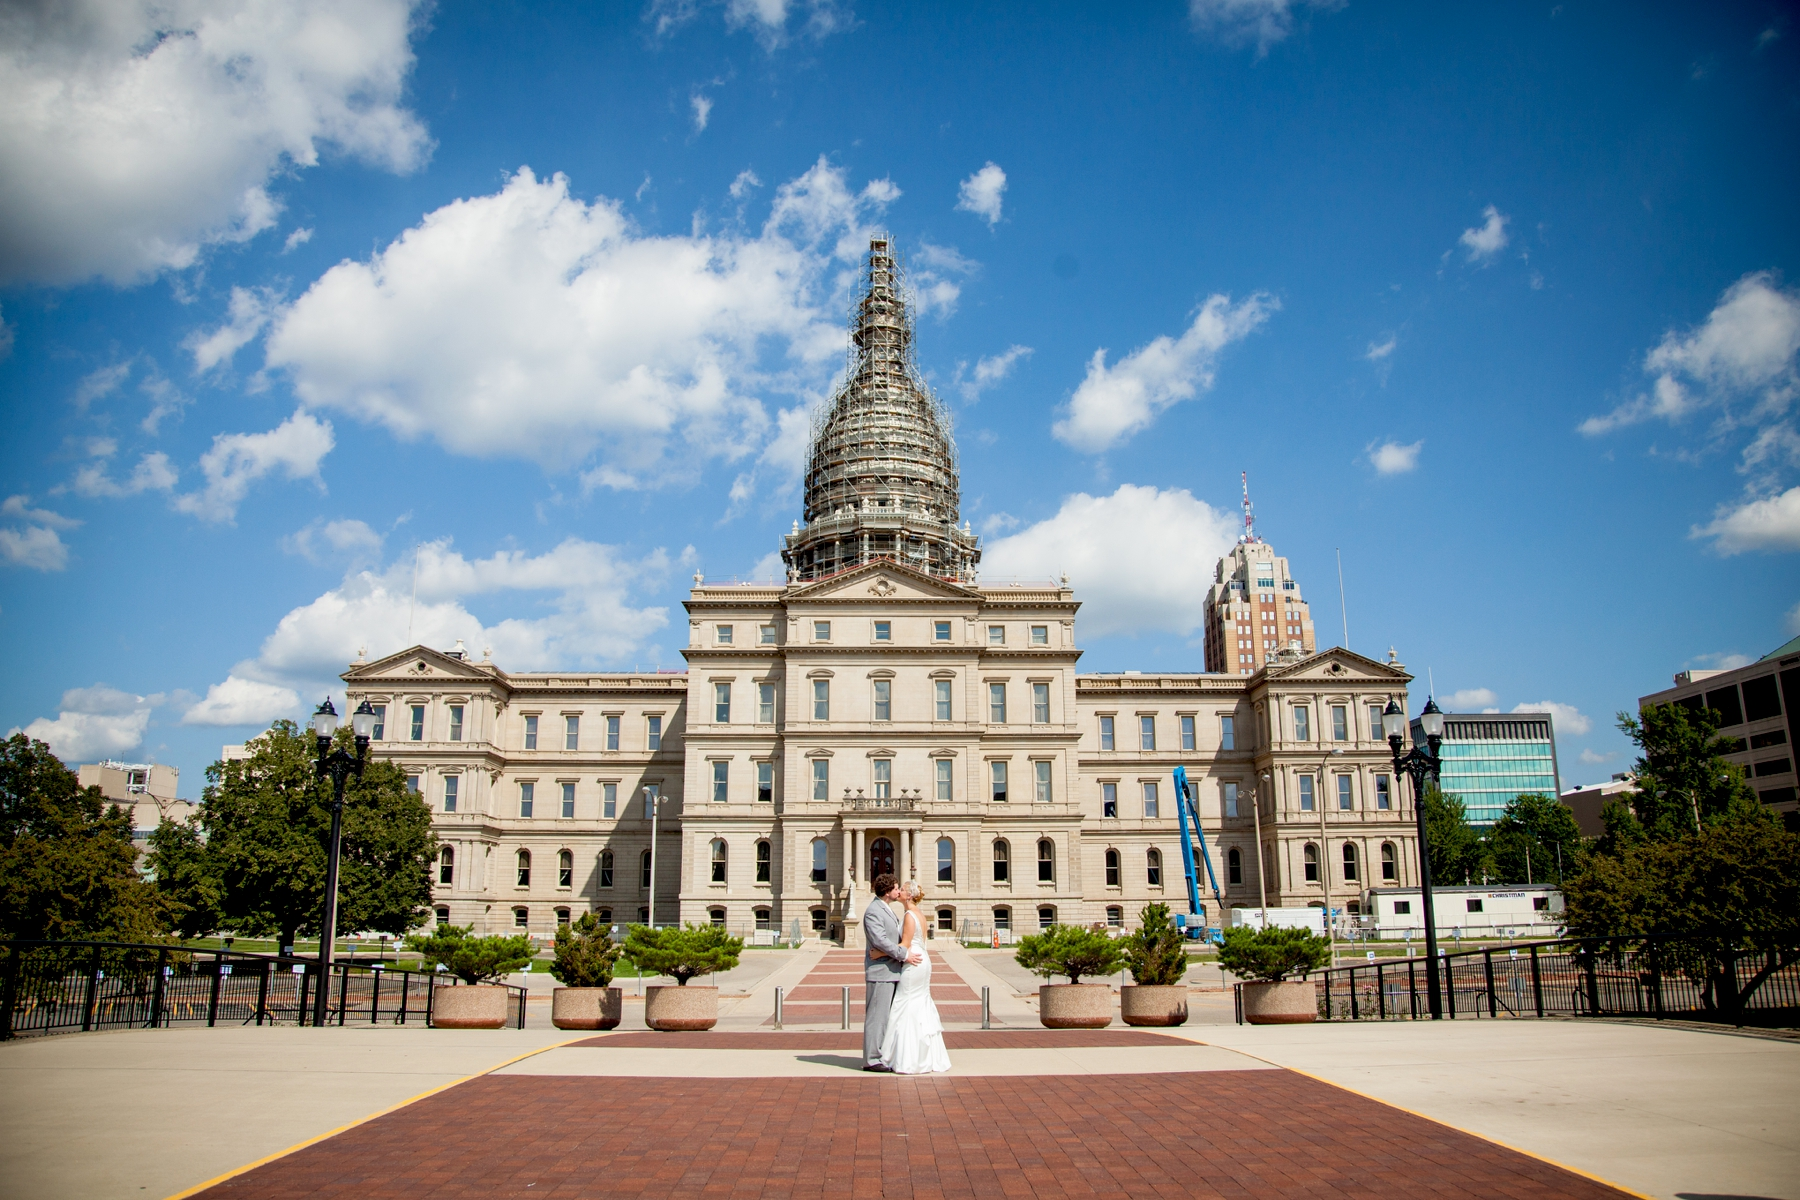 Brandon_Shafer_Photography_Chris_Lauren_Michigan_State_Capital_Wedding_0032.jpg